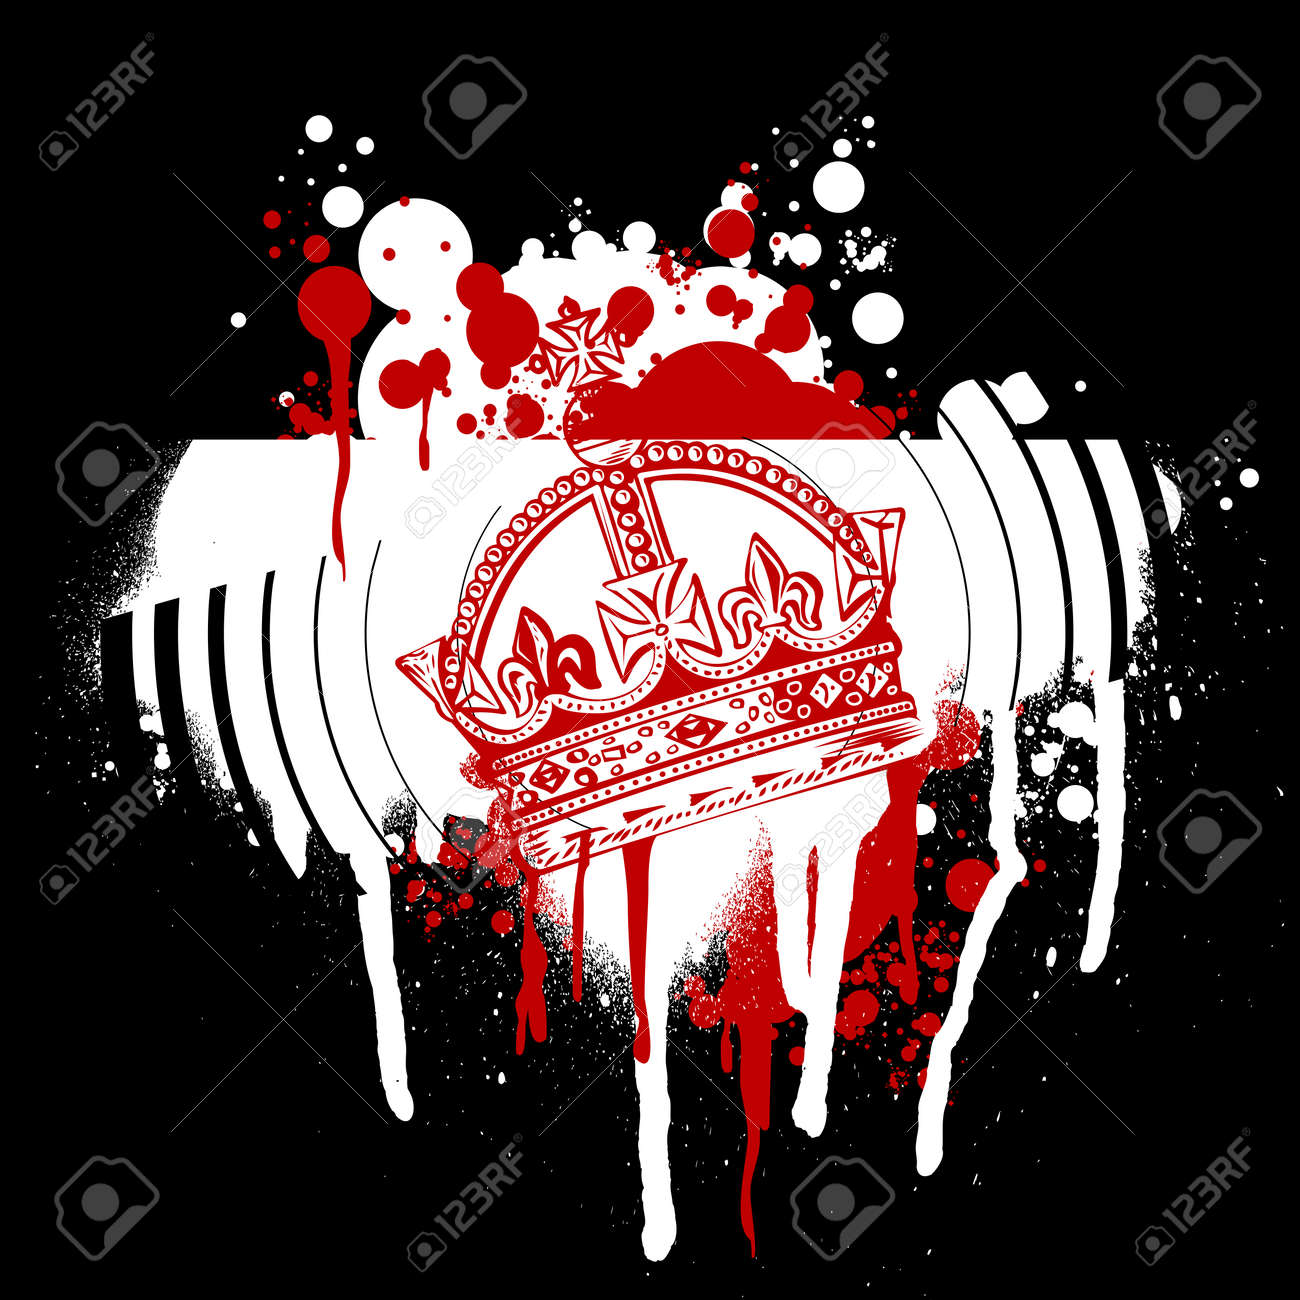 Red Crown Graffiti Stock Vector - 2240489